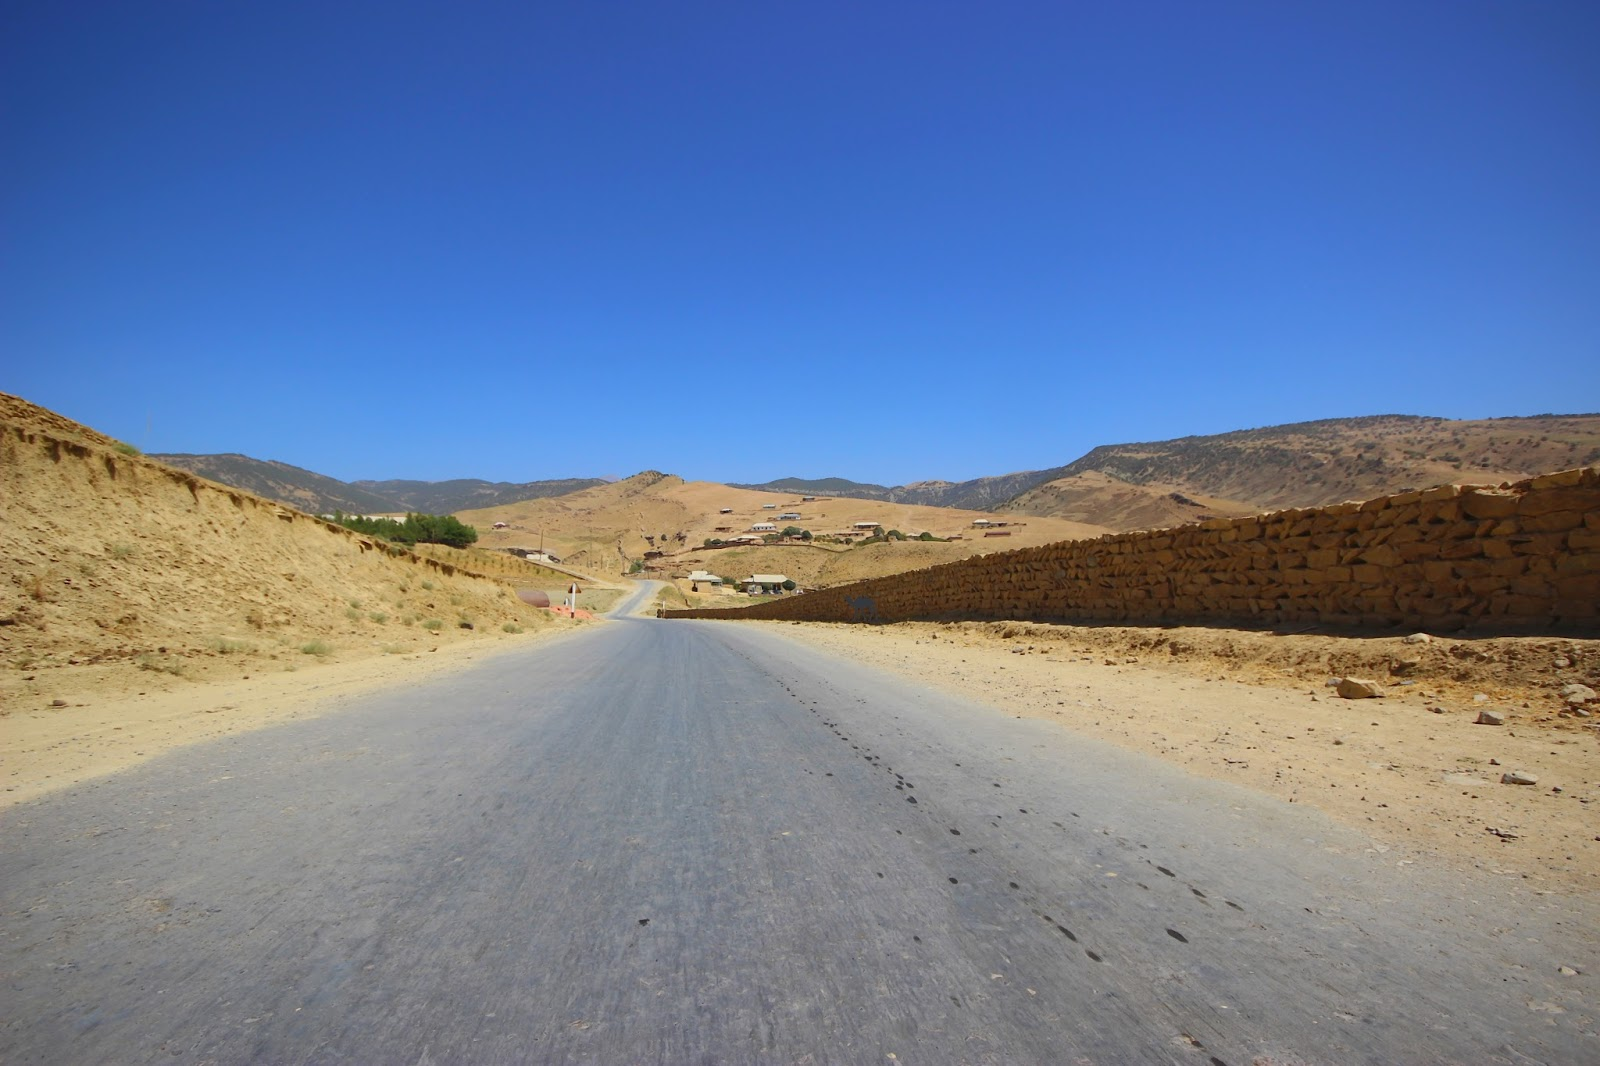 Le Chameau Bleu - Blog Voyage Ouzbékistan - Boysun - Voyage en Ouzbékistan Conseil